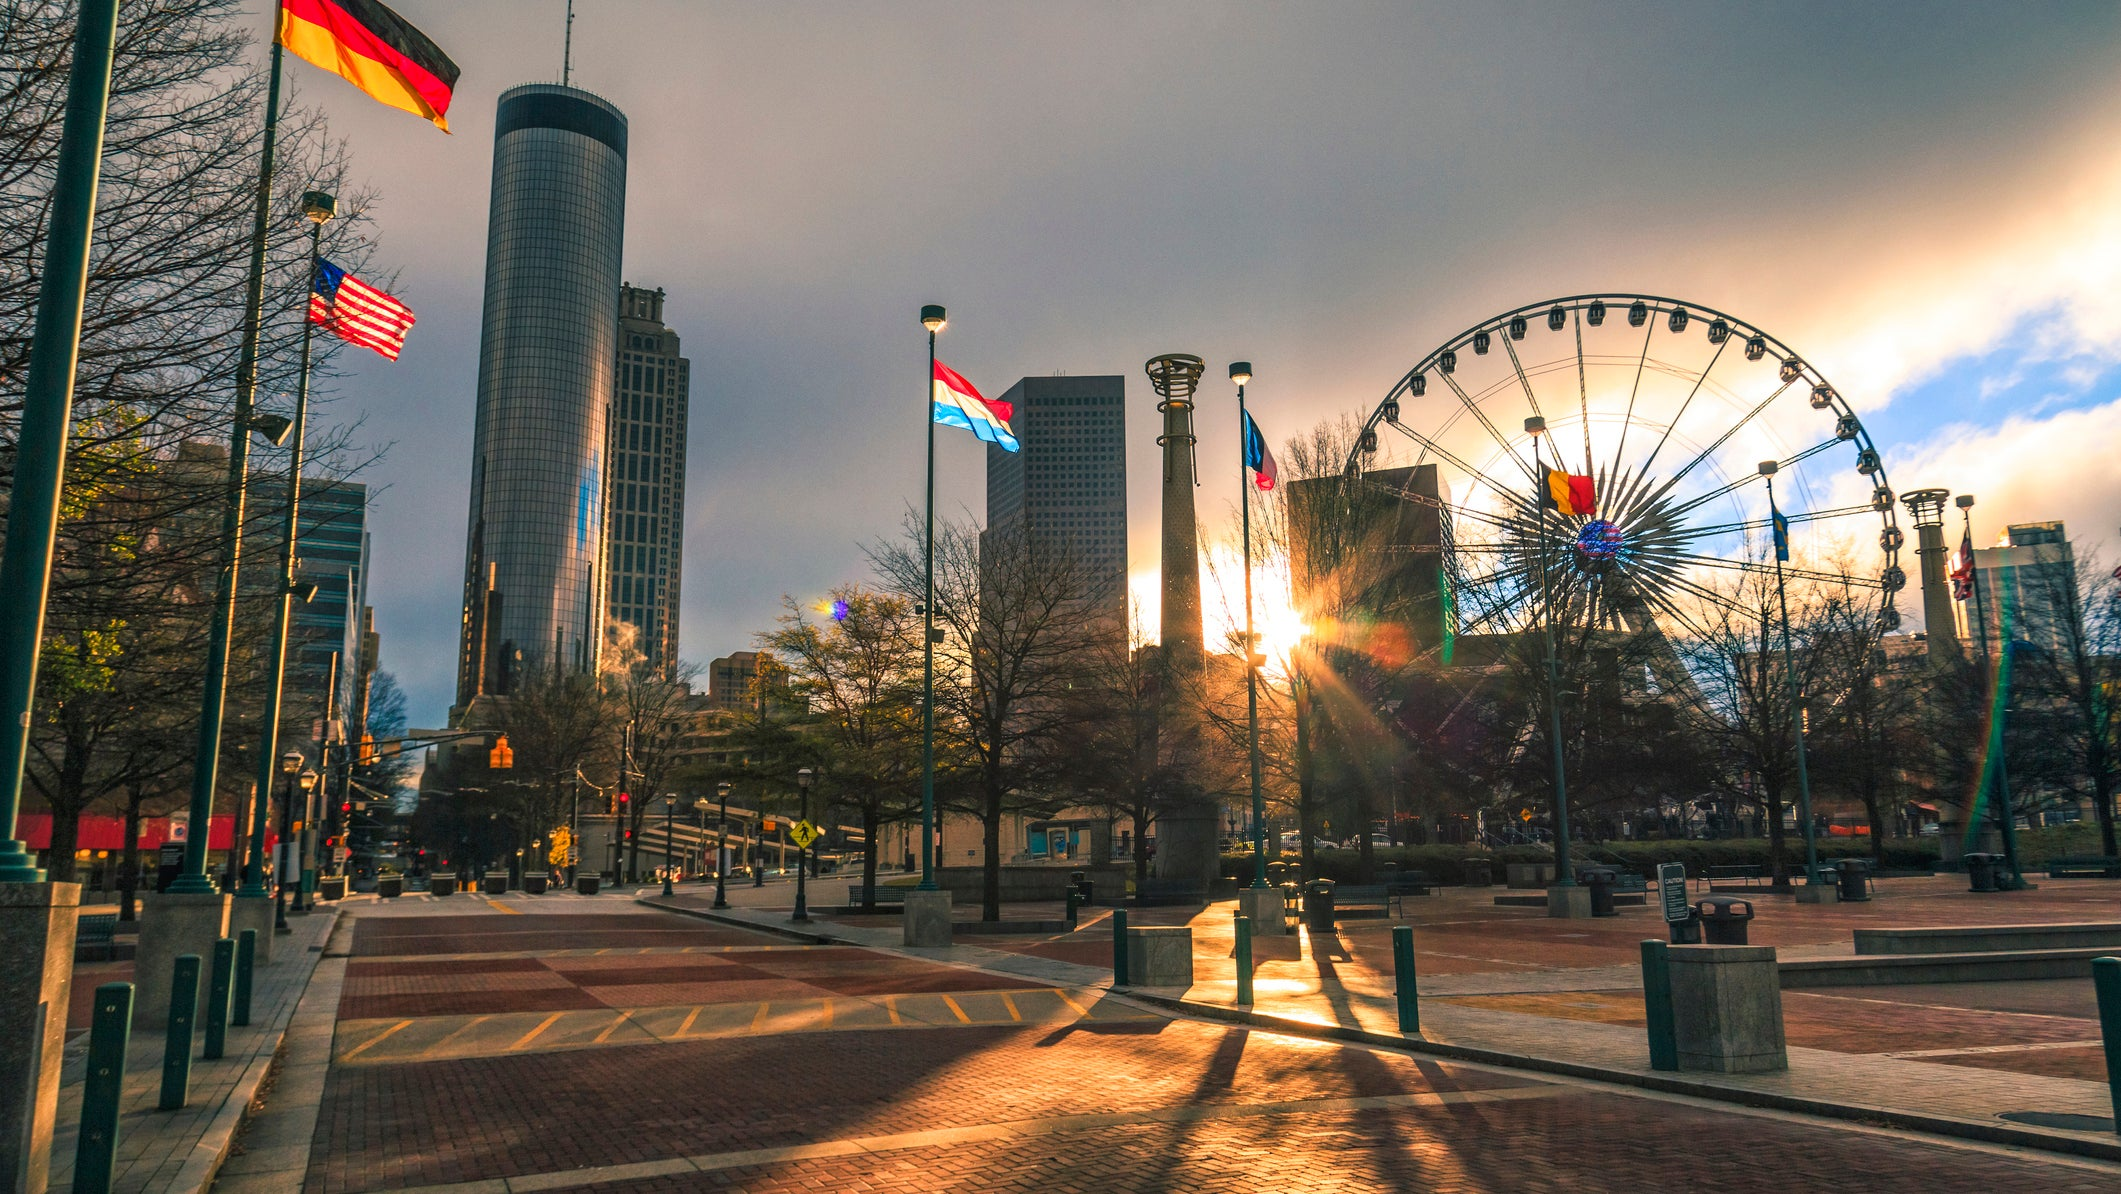 The Centennial Park in Atlanta, at sunrise, is a great run